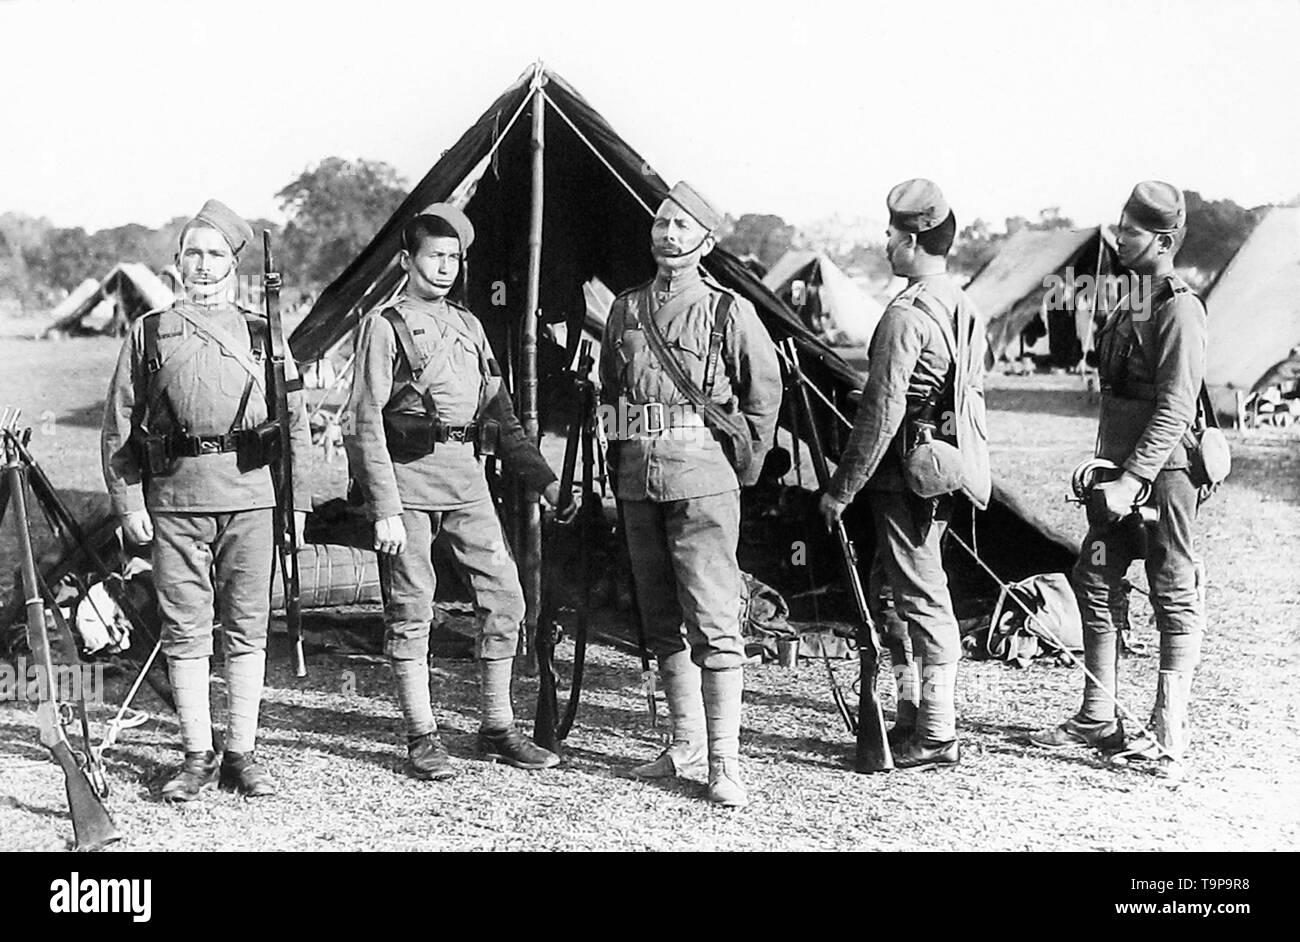 38th Gharwal Rifles, British Army - Stock Image